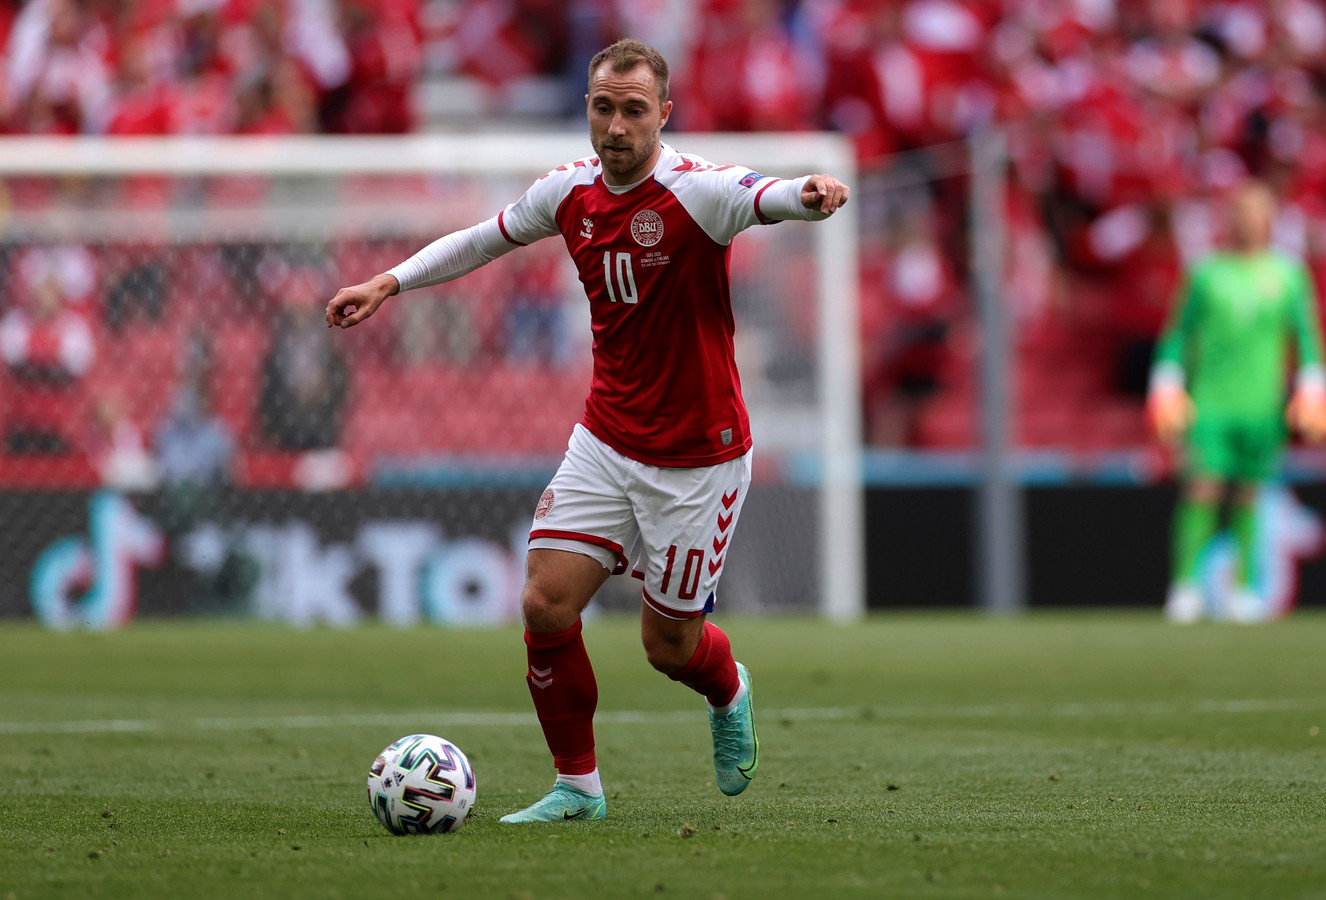 Eriksen en action durant le match Danemark-Finlande.